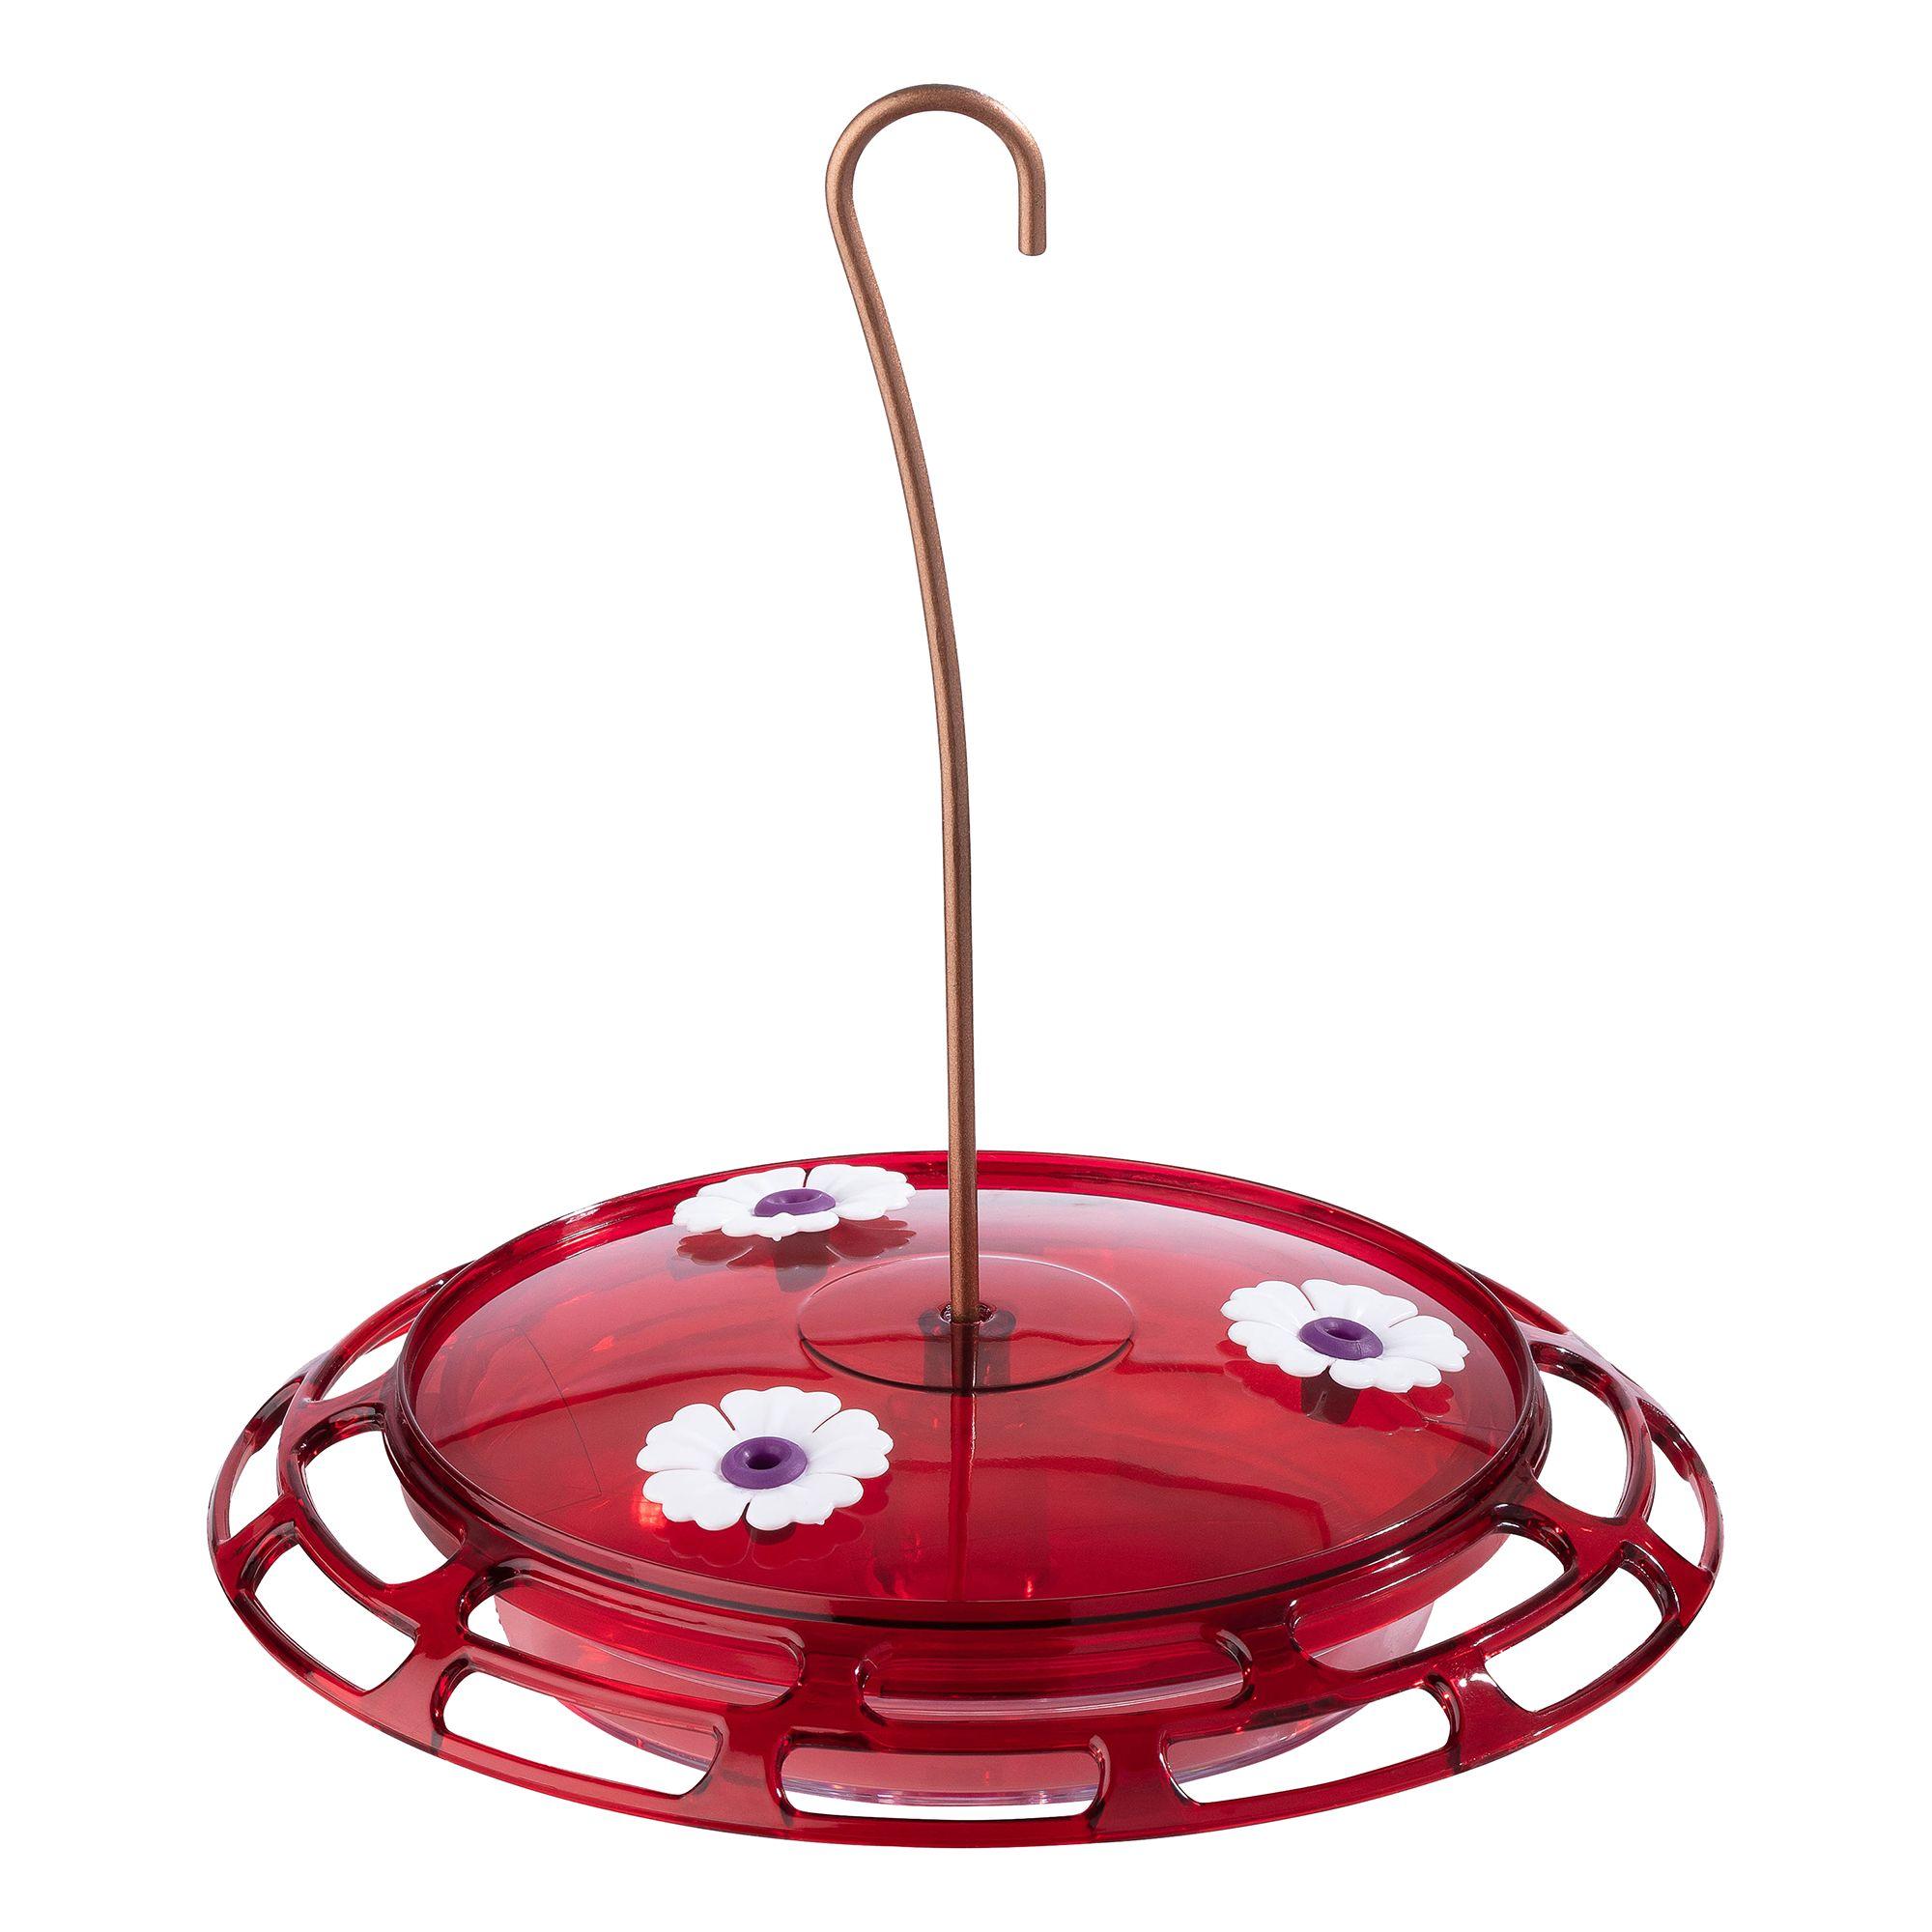 Stokes Select® 3 in 1 Hummingbird Feeder